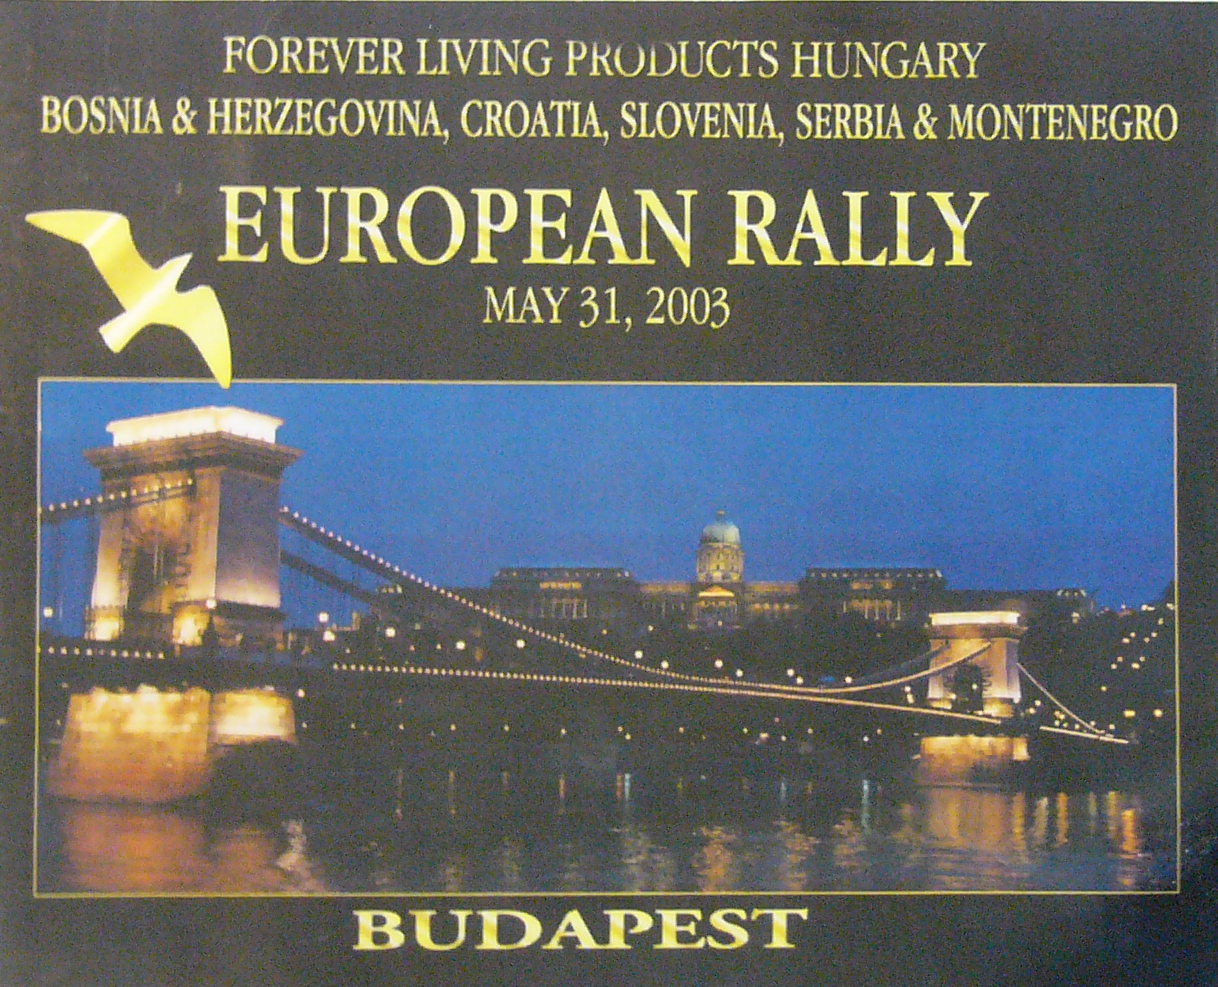 2003 05 31 European Rally Budapest